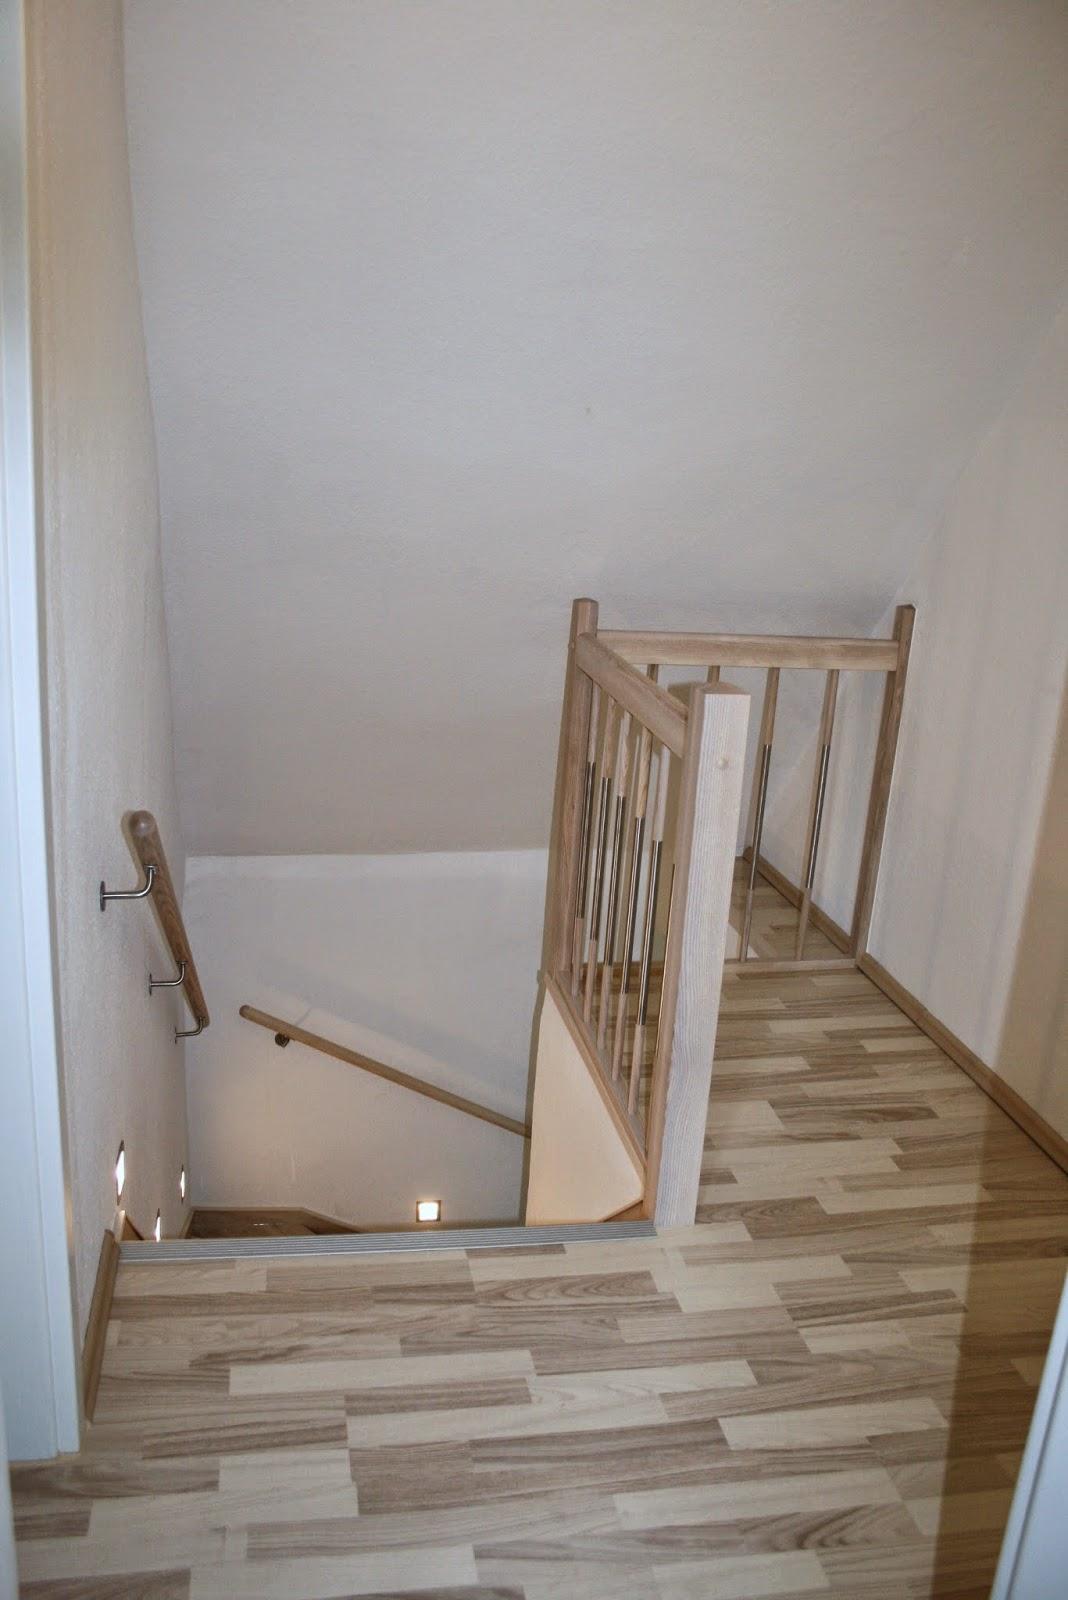 Treppenrenovierung - Oberes Podest am Treppenausgang